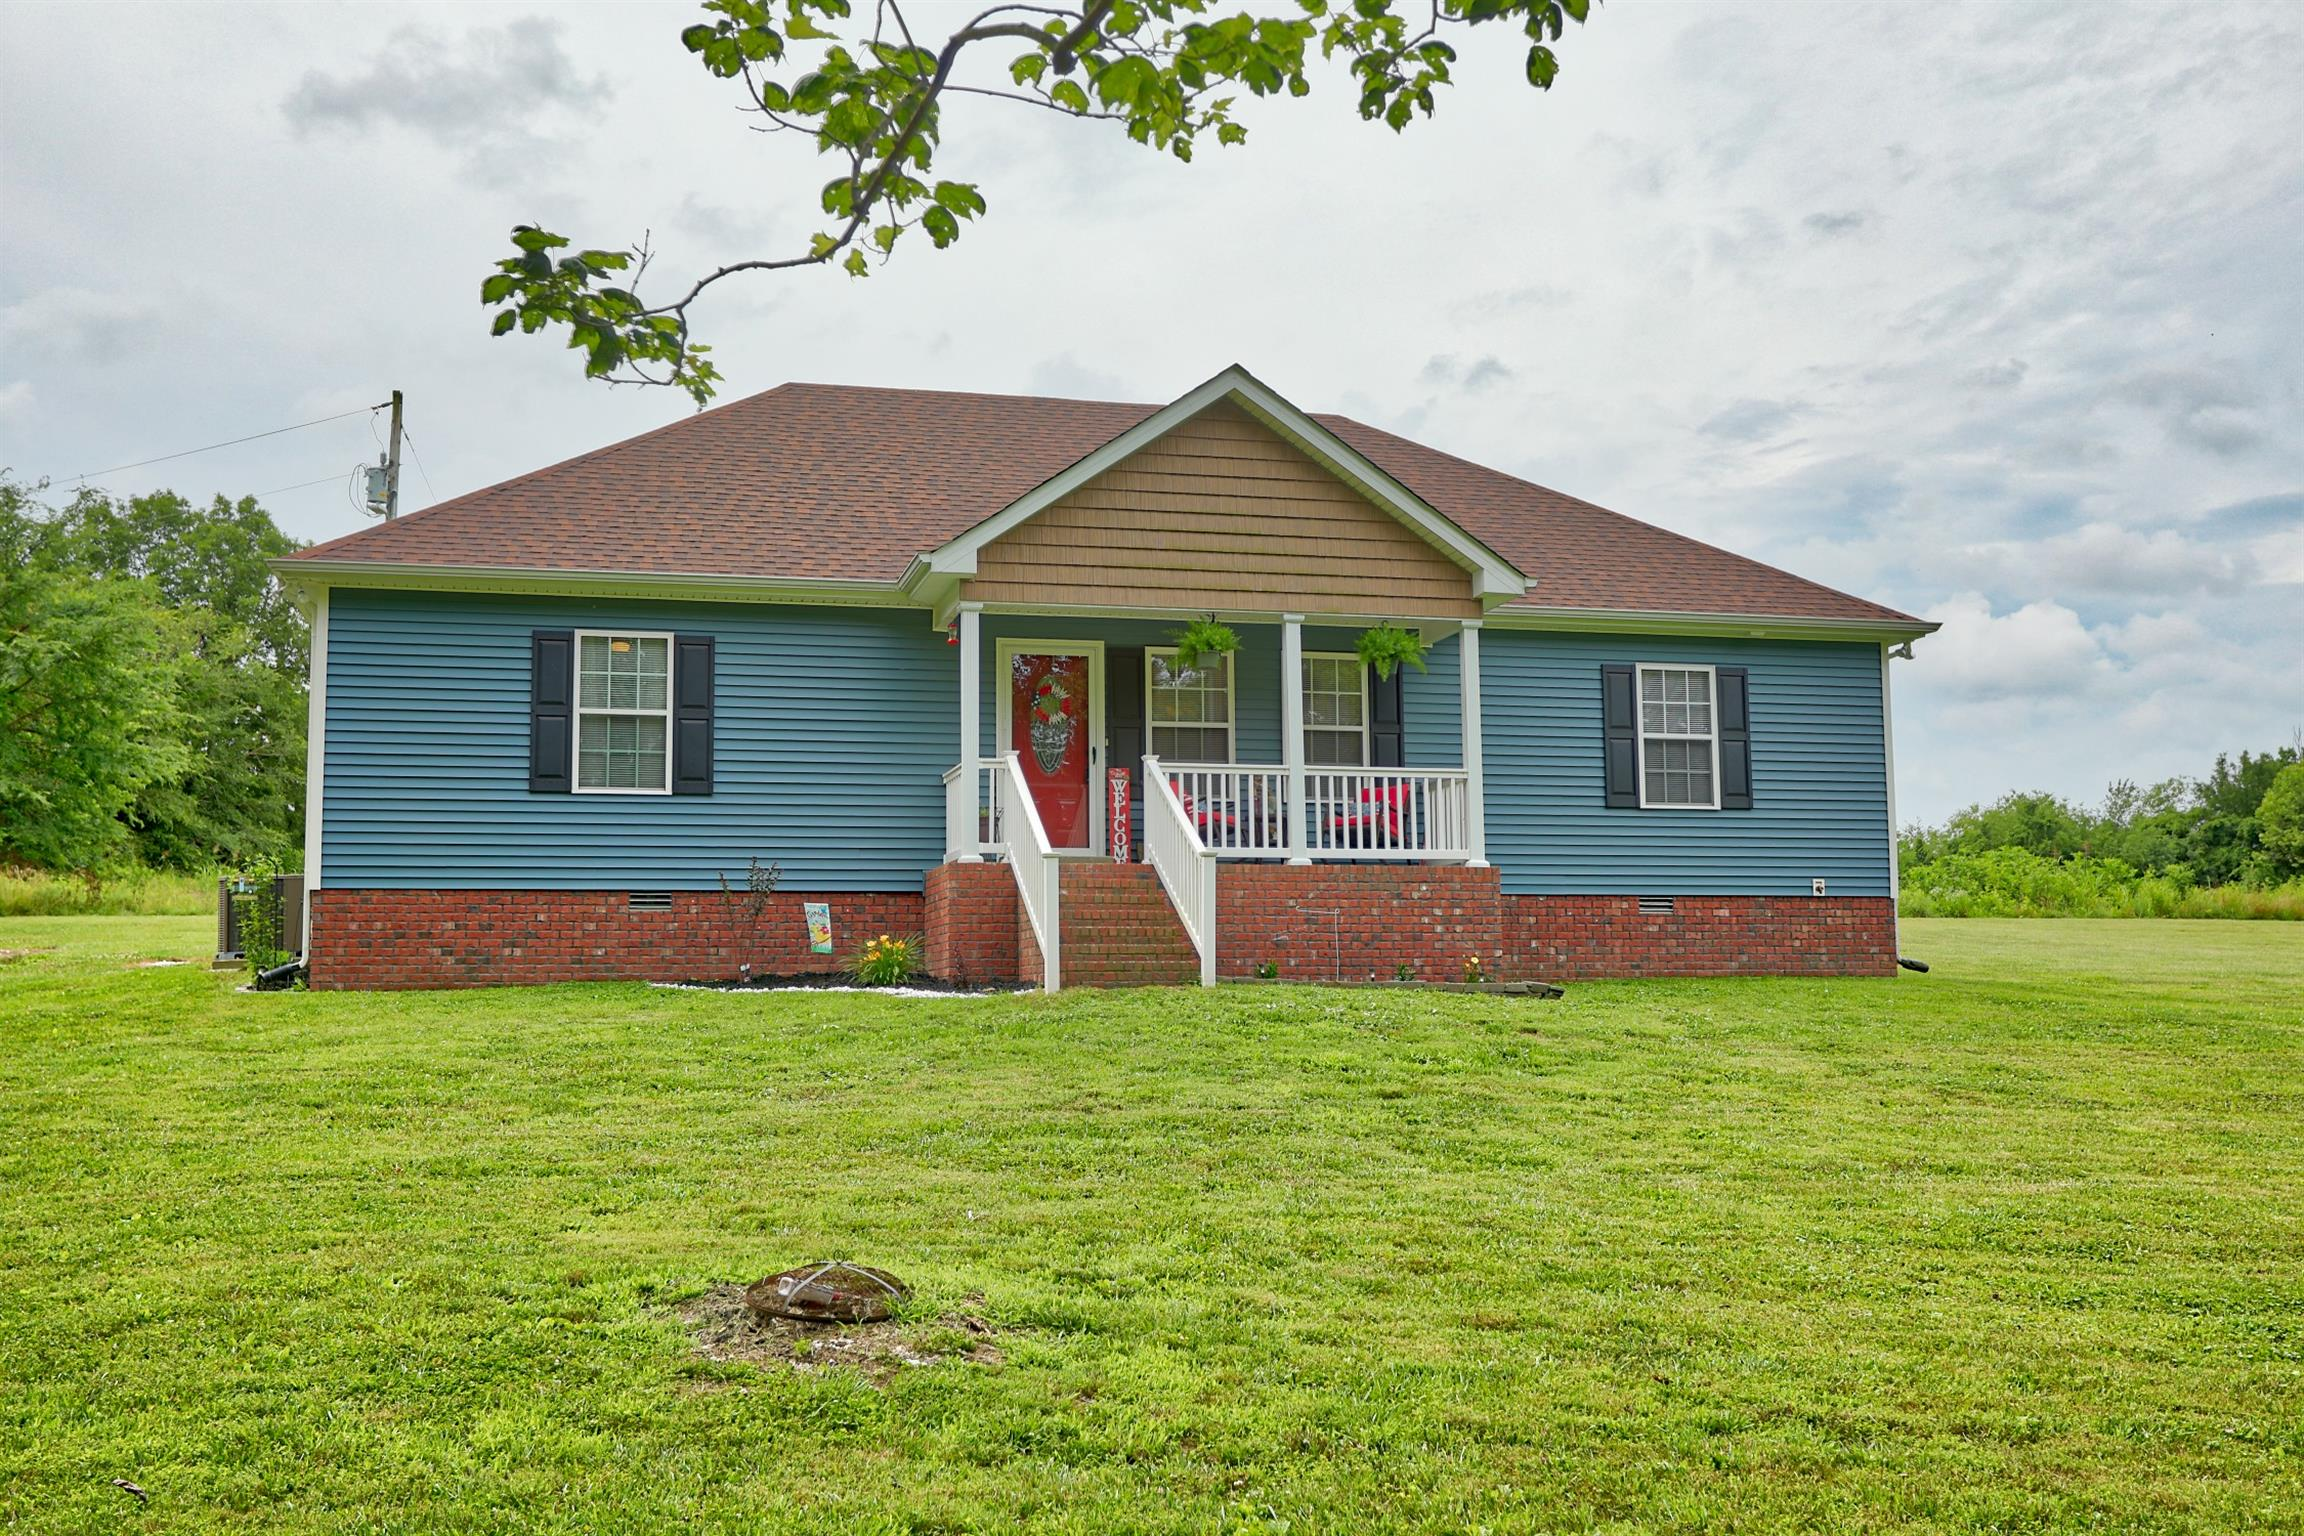 3828 52E Hwy, Bethpage, TN 37022 - Bethpage, TN real estate listing